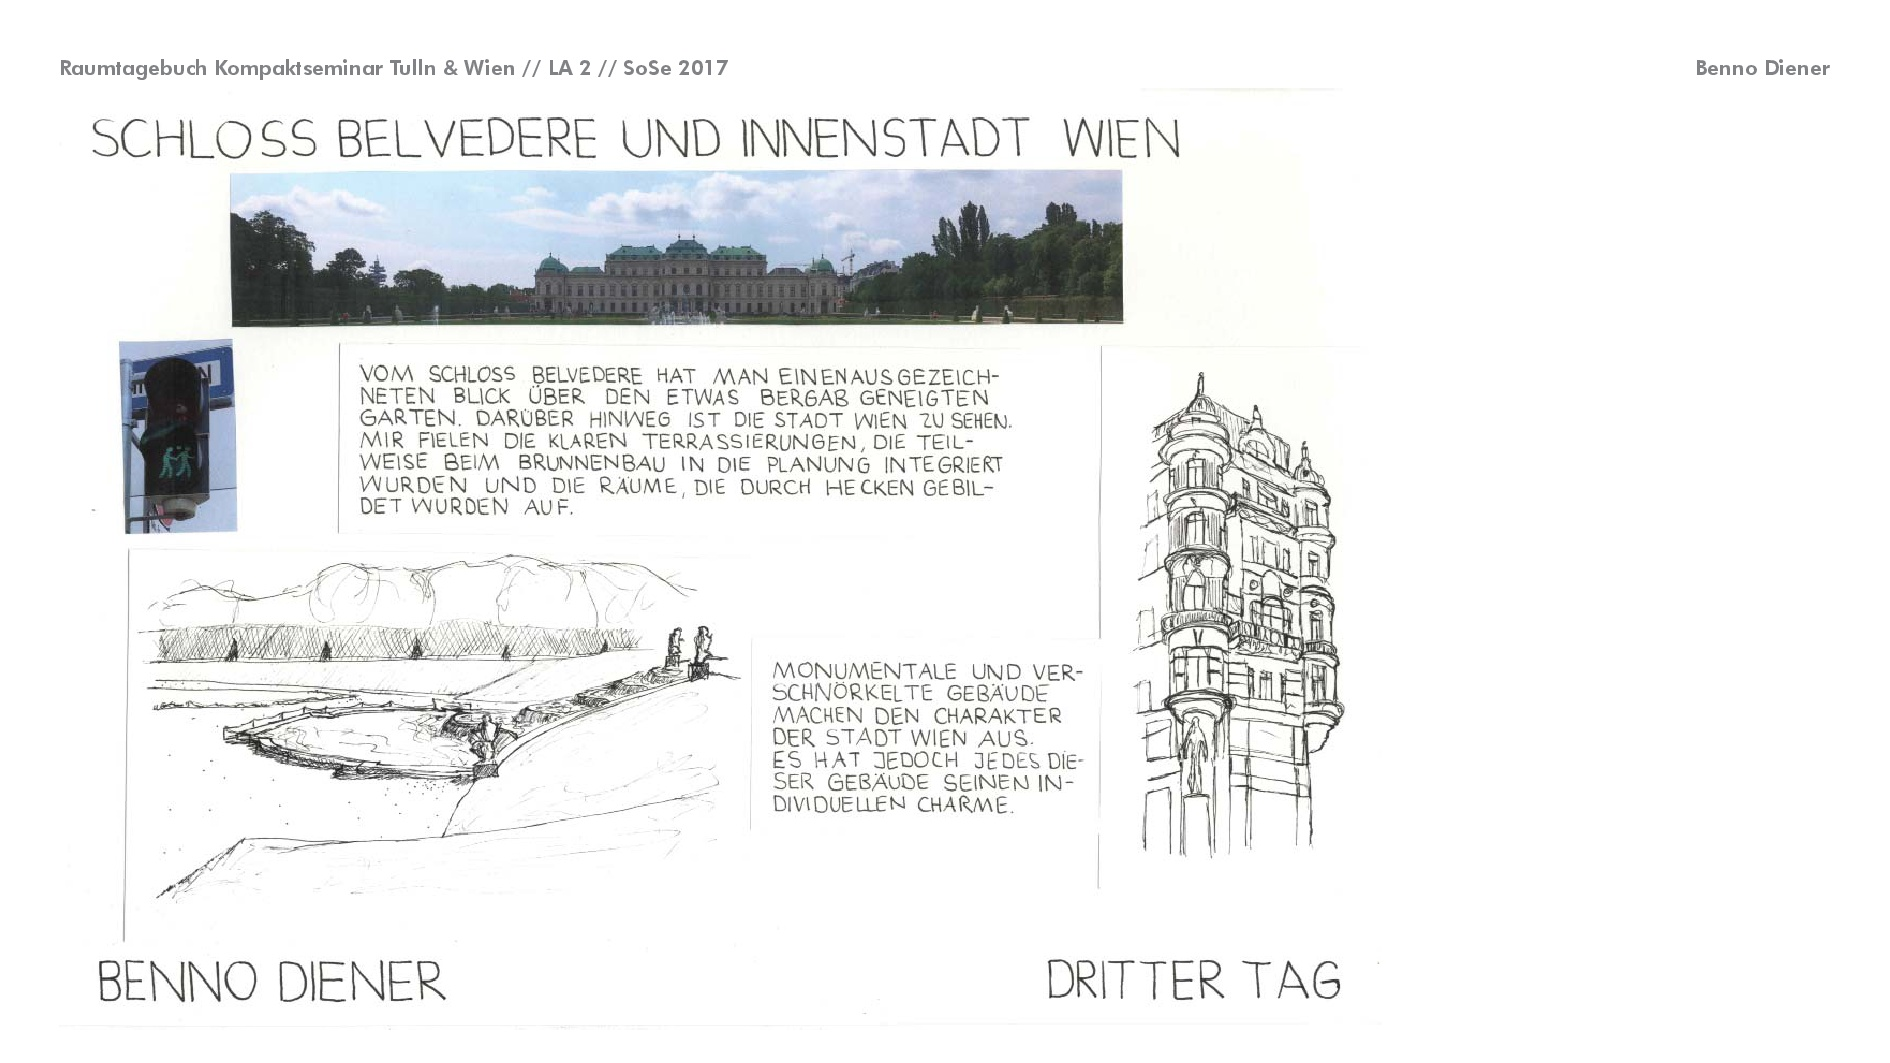 NEU Screen Raumtagebuch Tulln Wien SoSe 17 009